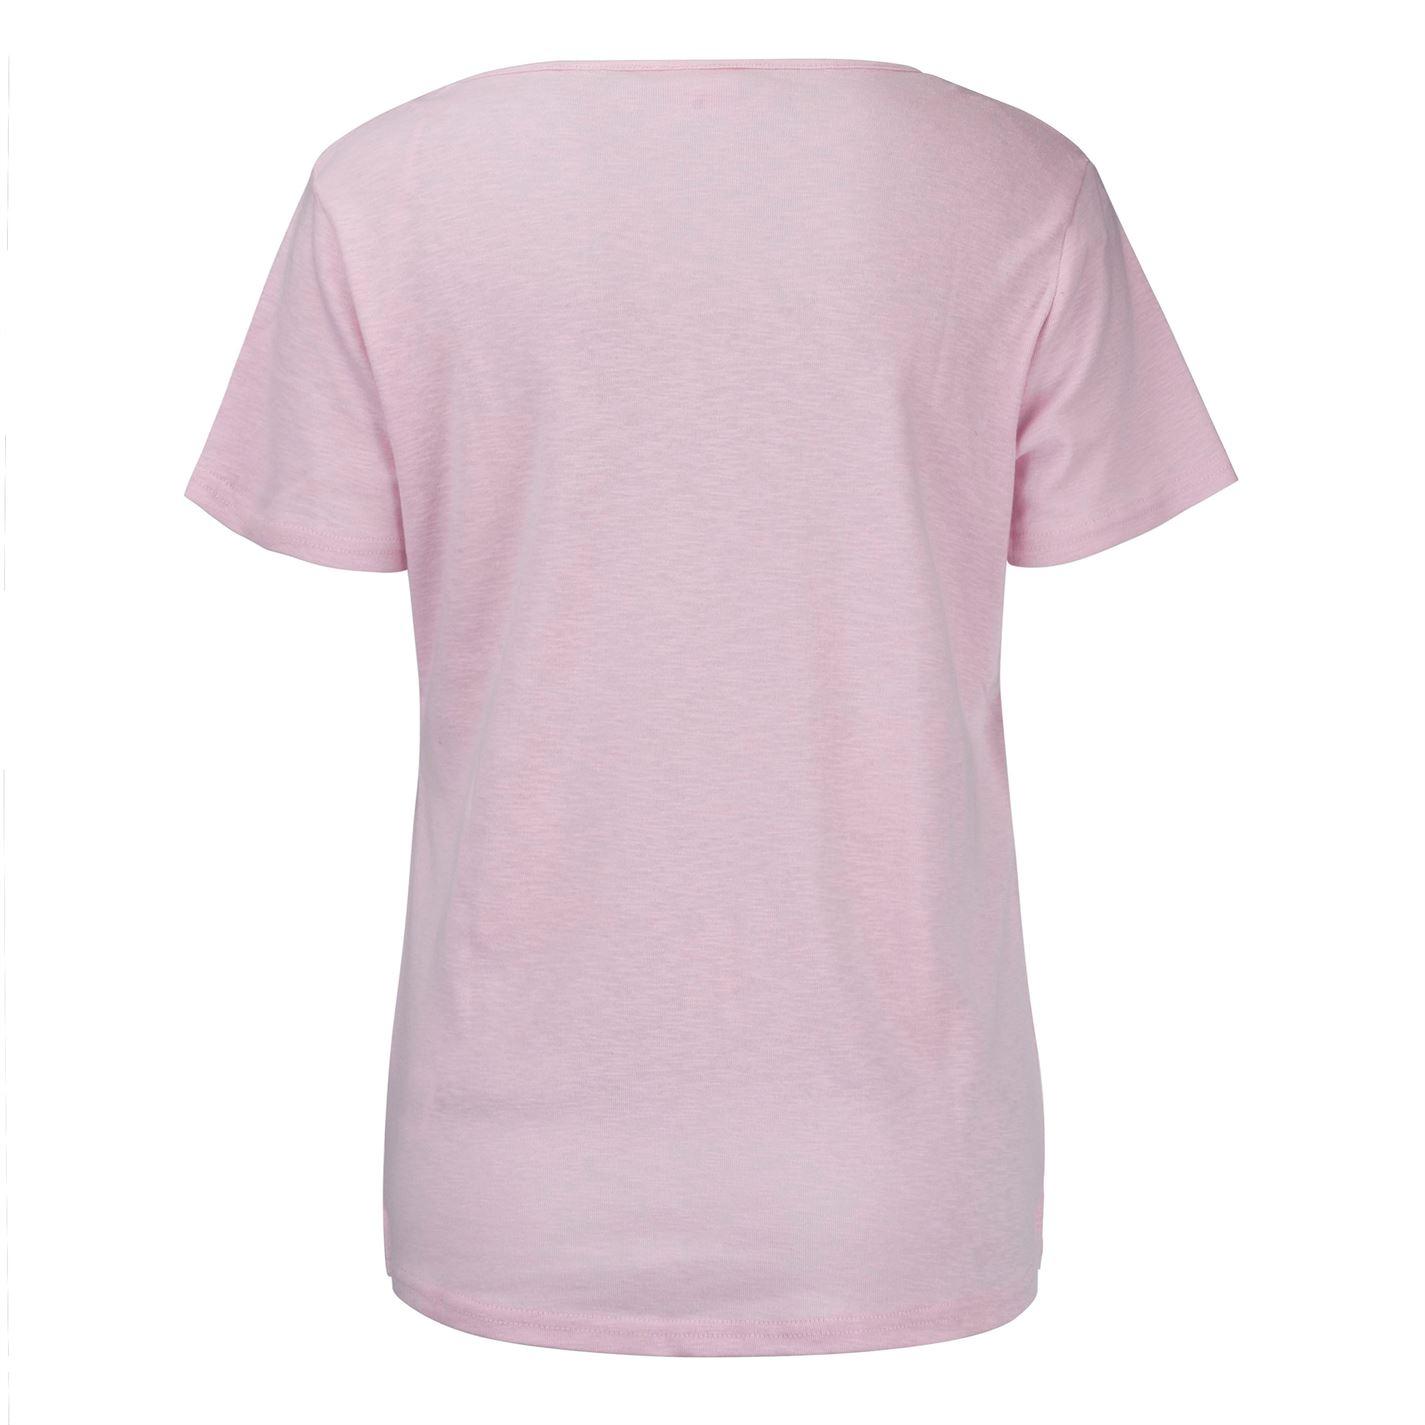 Lee Cooper Pocket T Shirt Donna Girocollo Tee Top manica corta cotone circonferenza petto